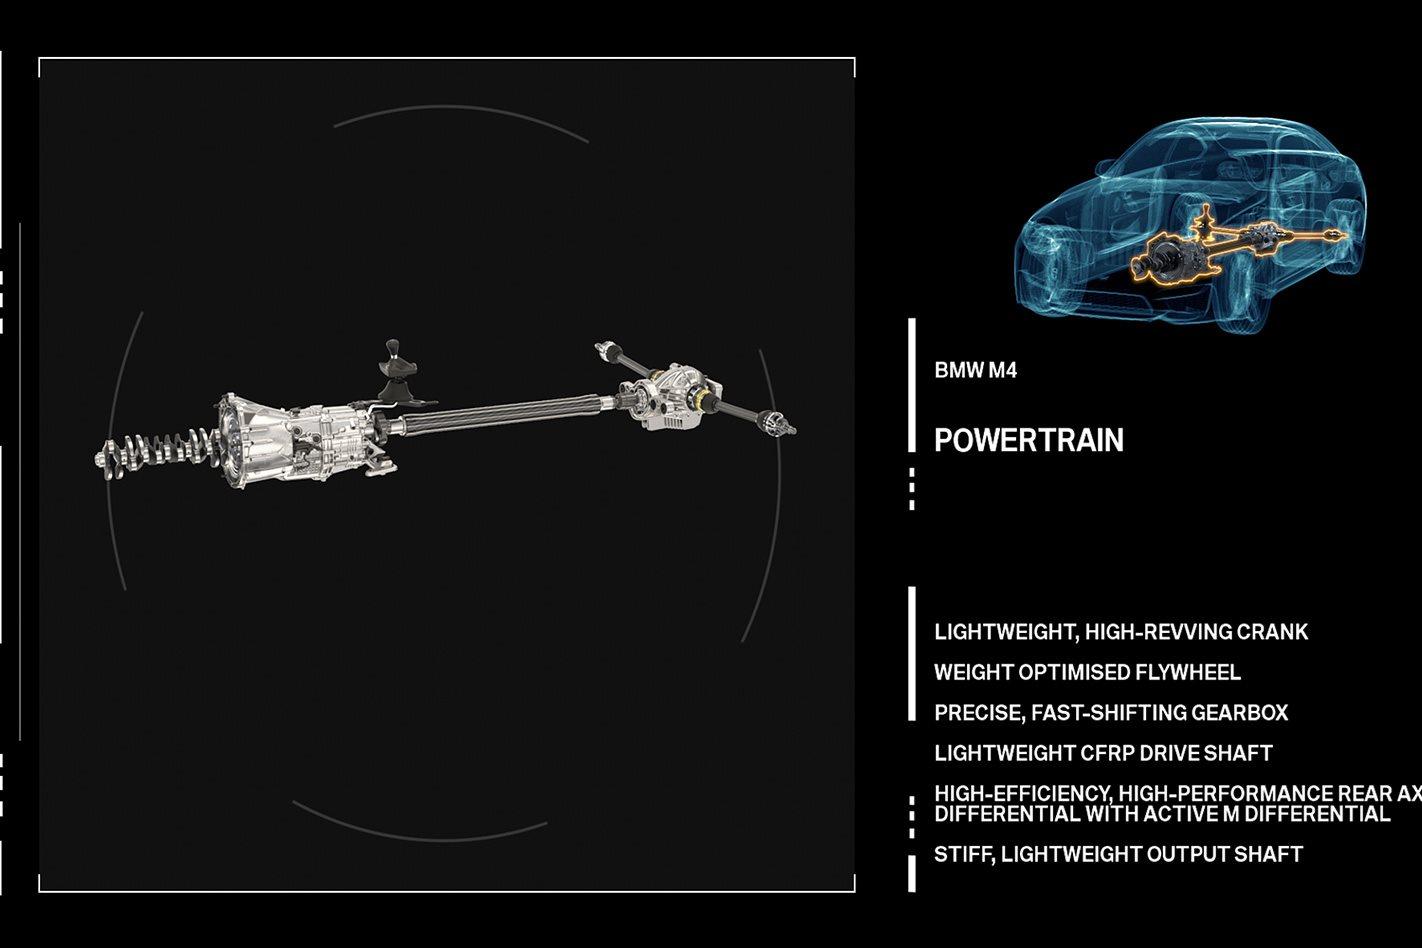 2018 BMW M4 powertrain changes